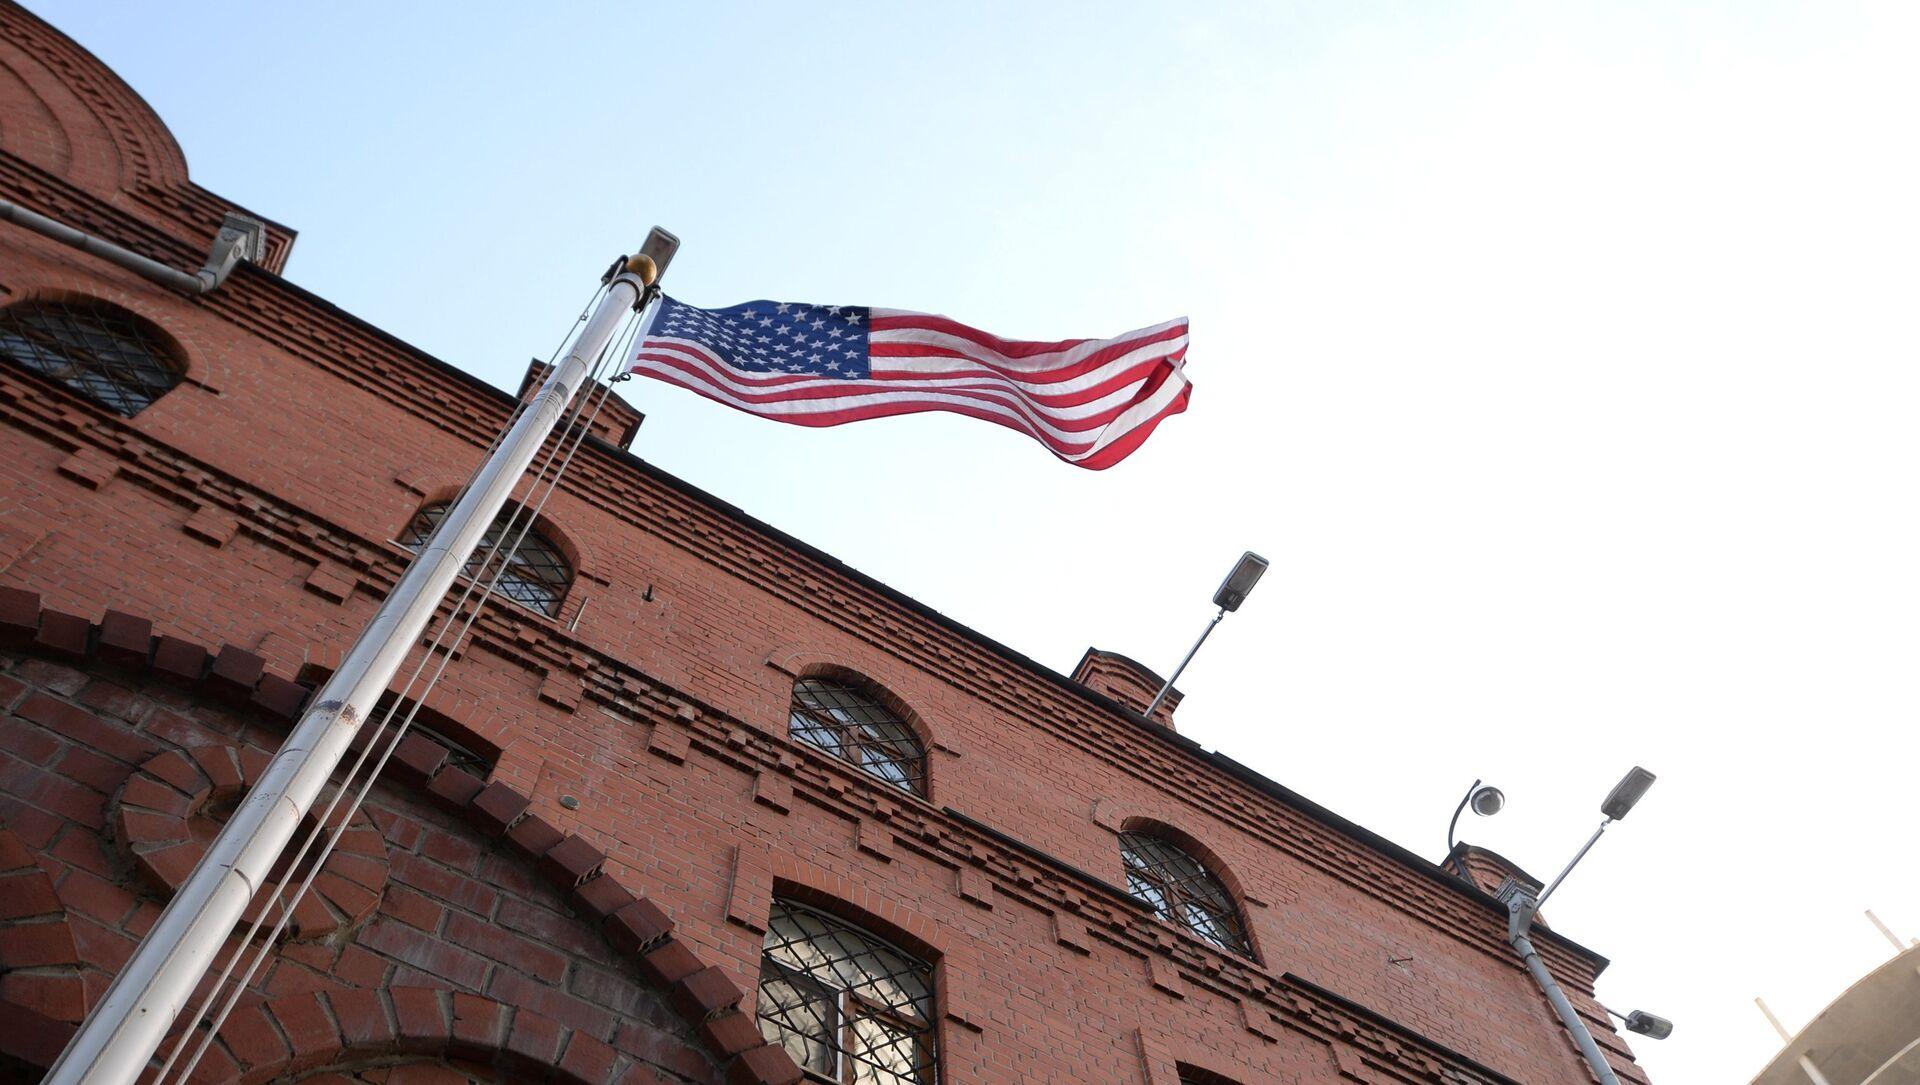 El consulado de EEUU en Ekaterimburgo, Rusia - Sputnik Mundo, 1920, 19.12.2020